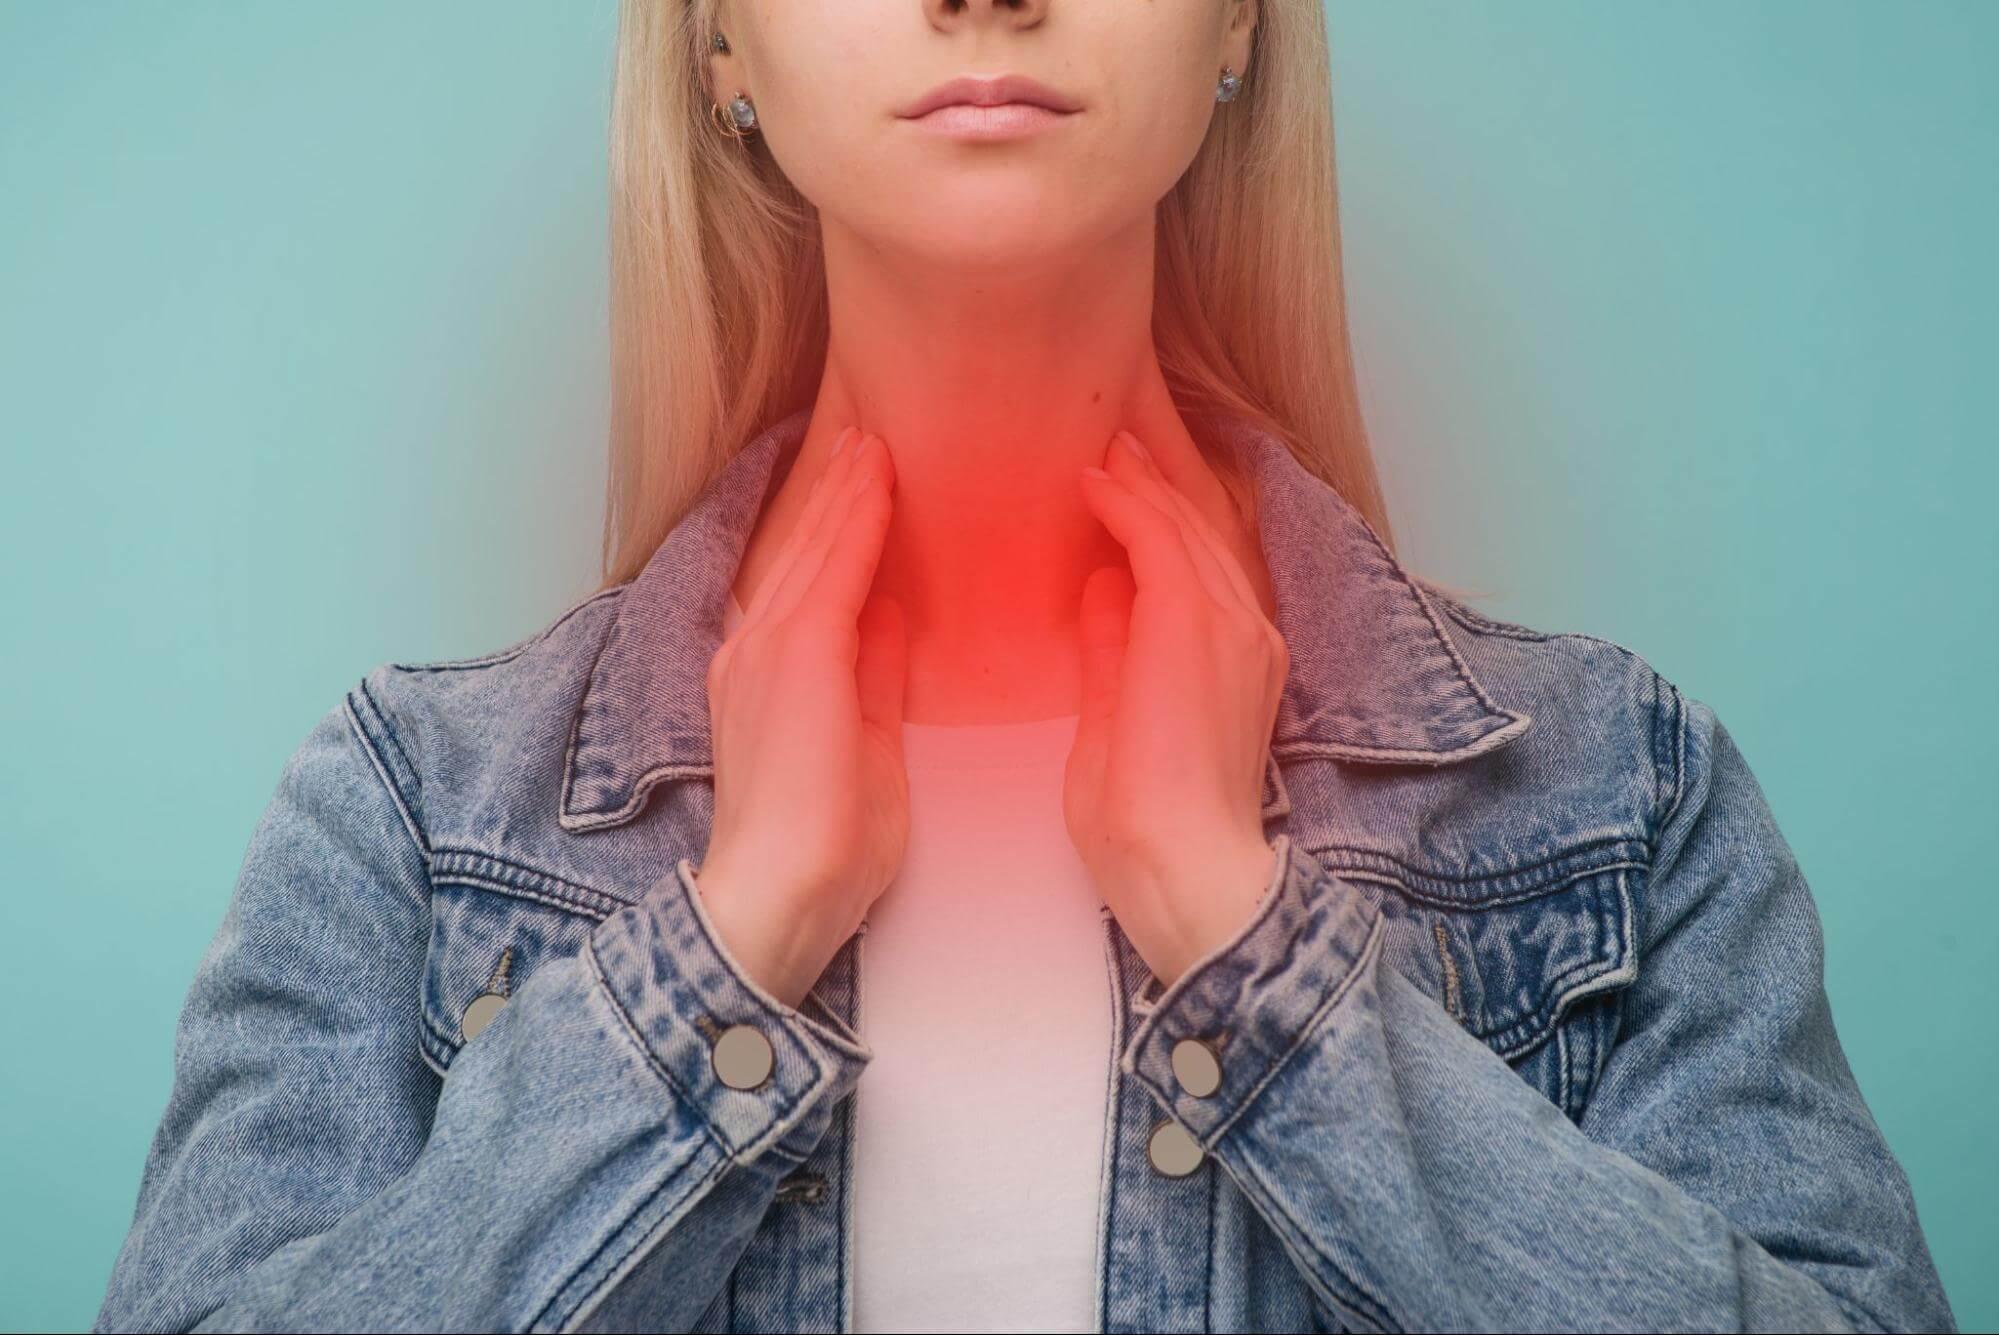 LPR symptoms: Woman in pain, touching her neck